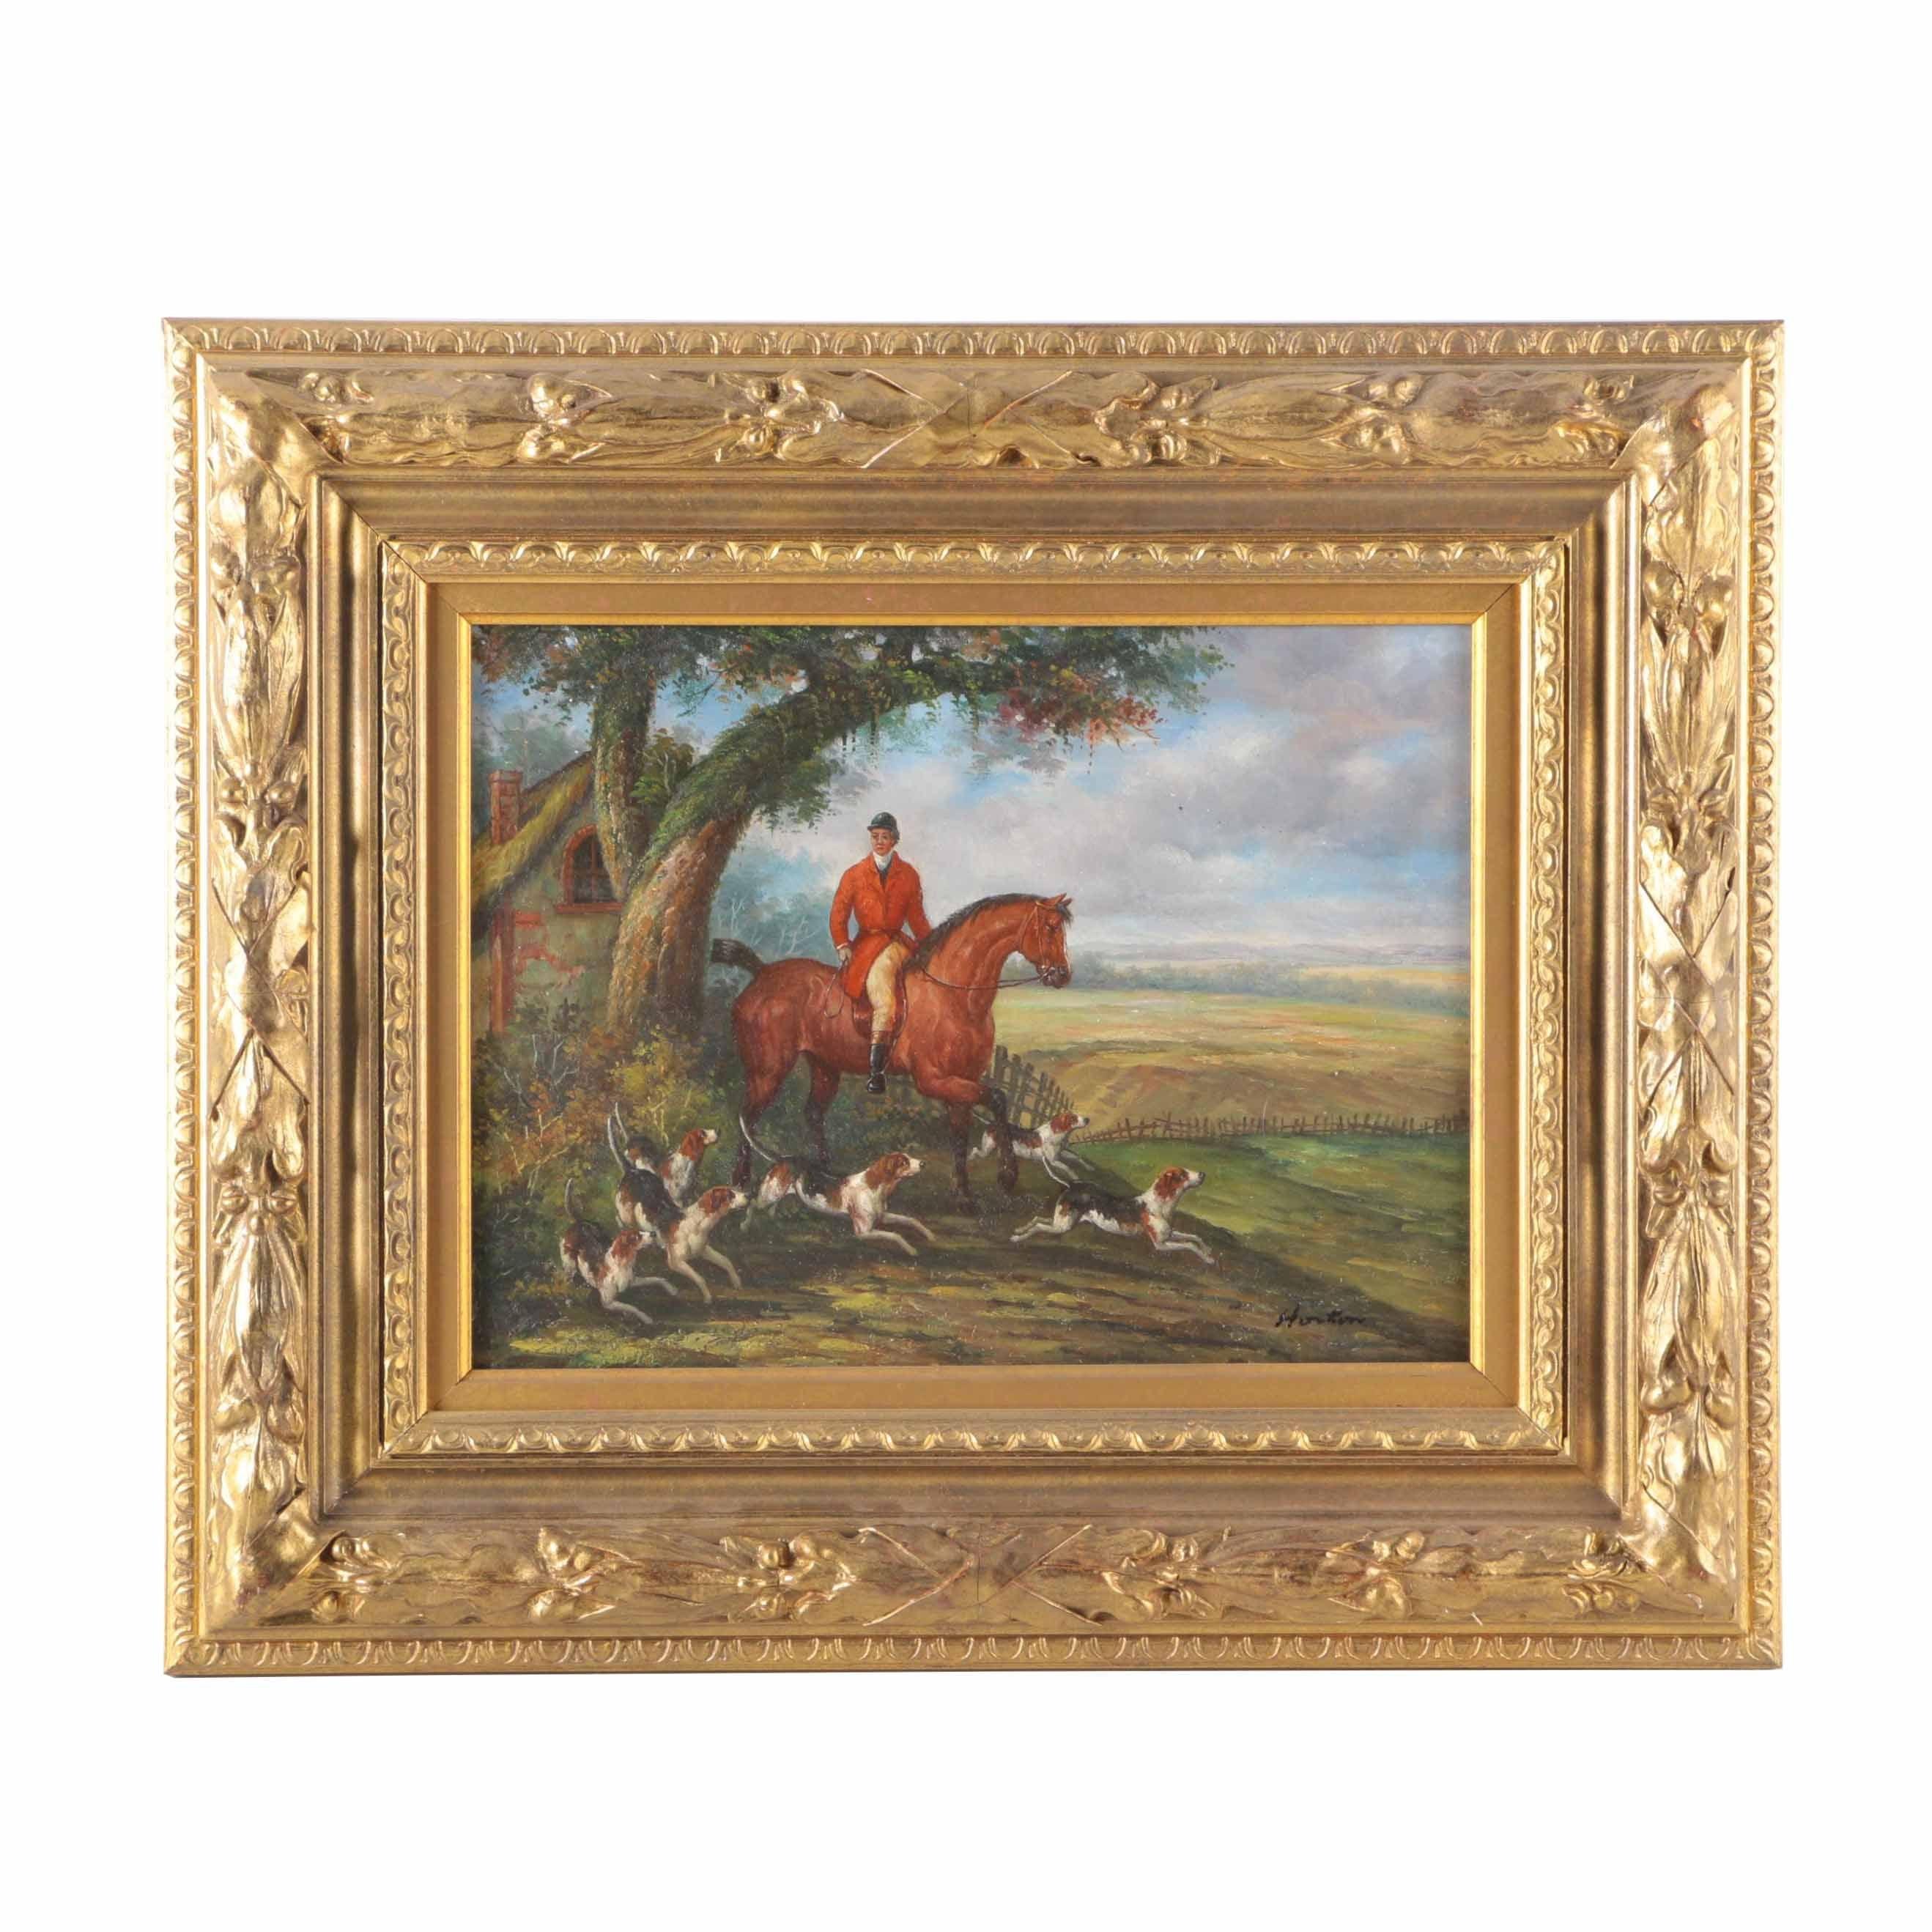 Horton Oil Painting on Board Hunting Scene